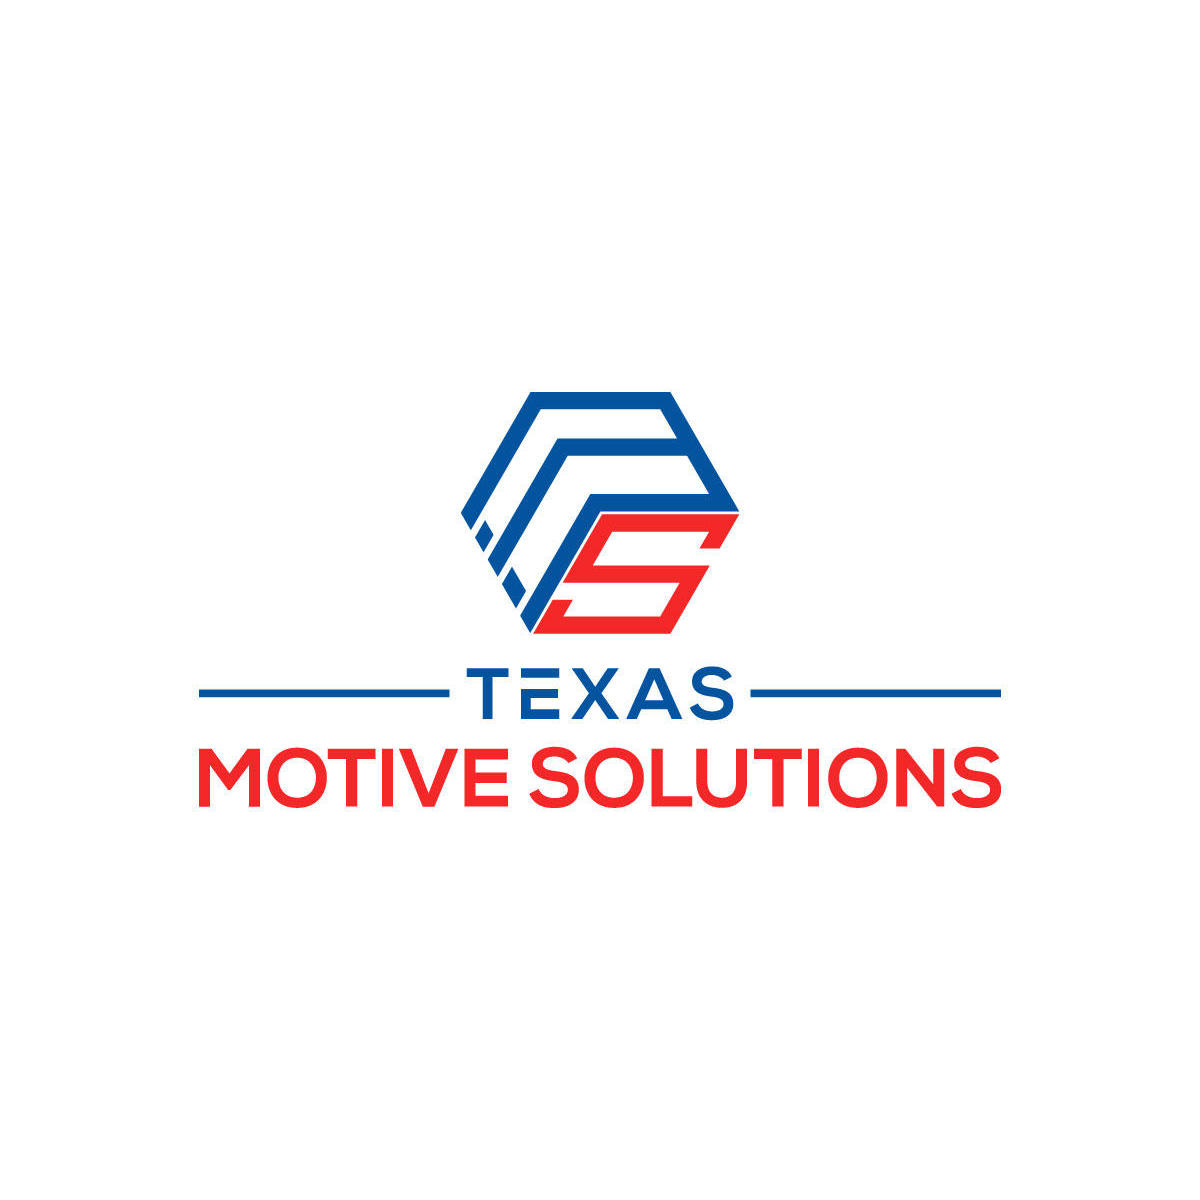 Texas Motive Solutions